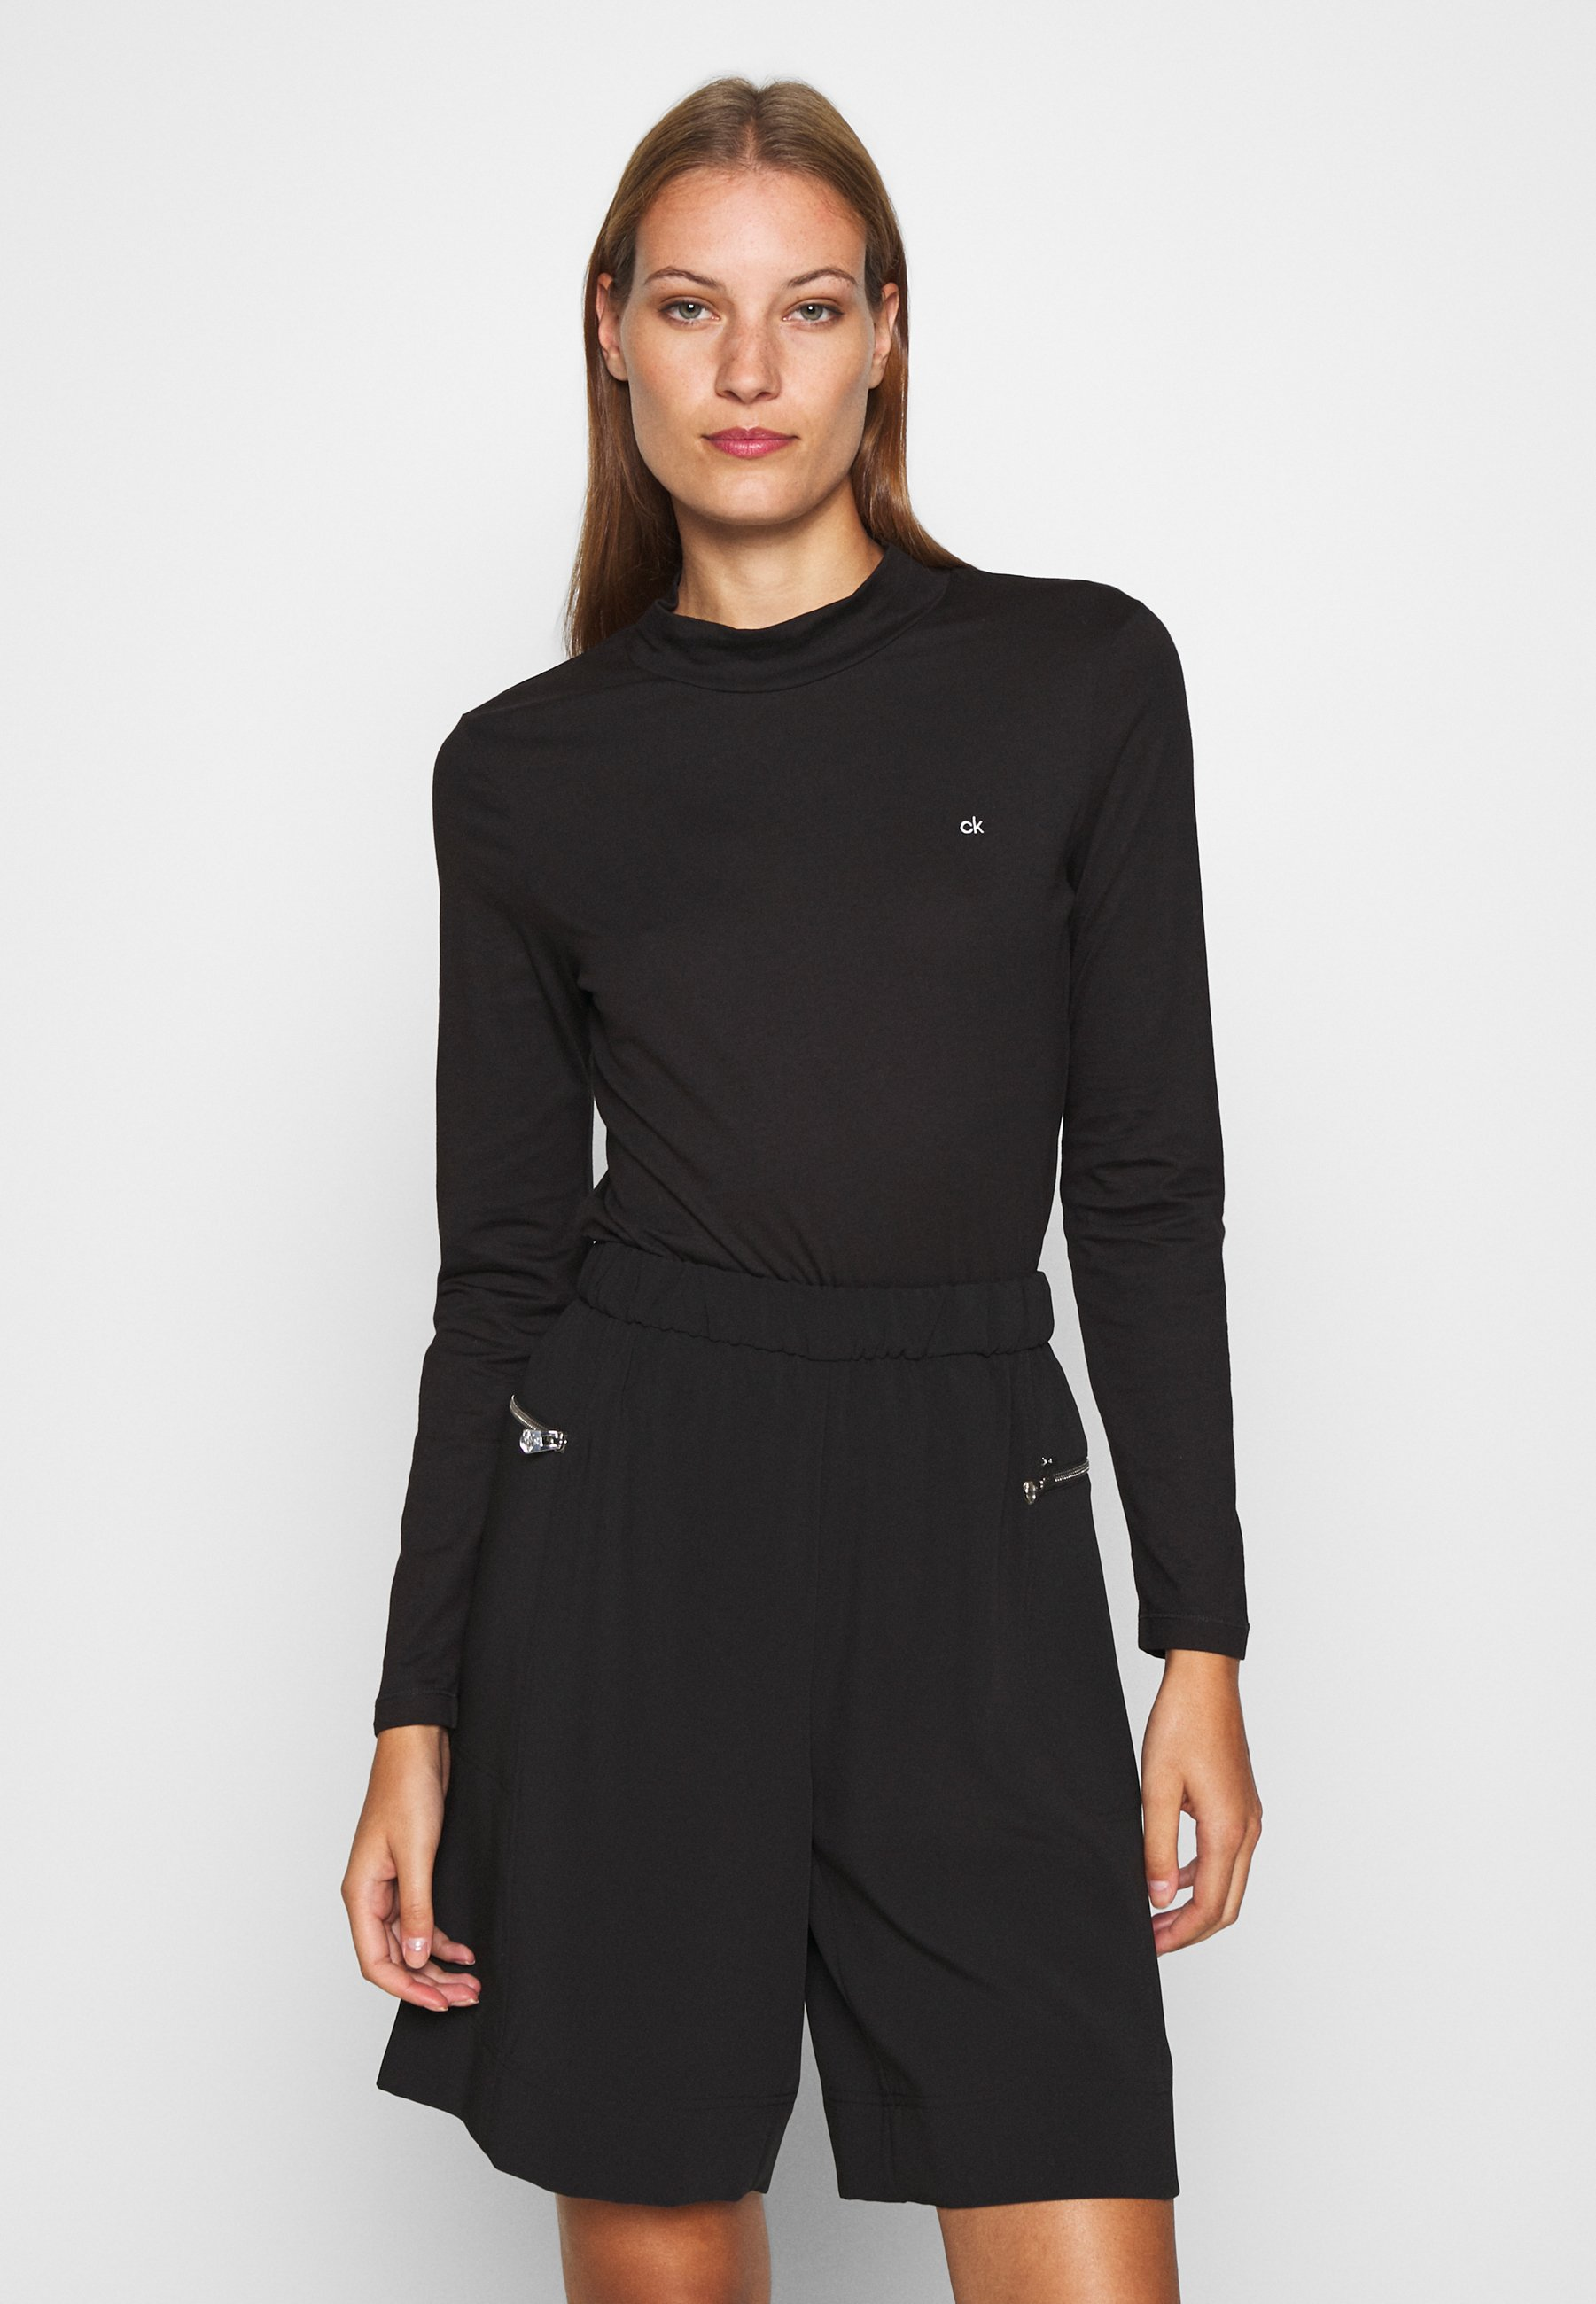 Very Cheap Reliable Women's Clothing Calvin Klein LIQUID TOUCH TURTLE NECK Long sleeved top black A9sbiTufi r766biXyb